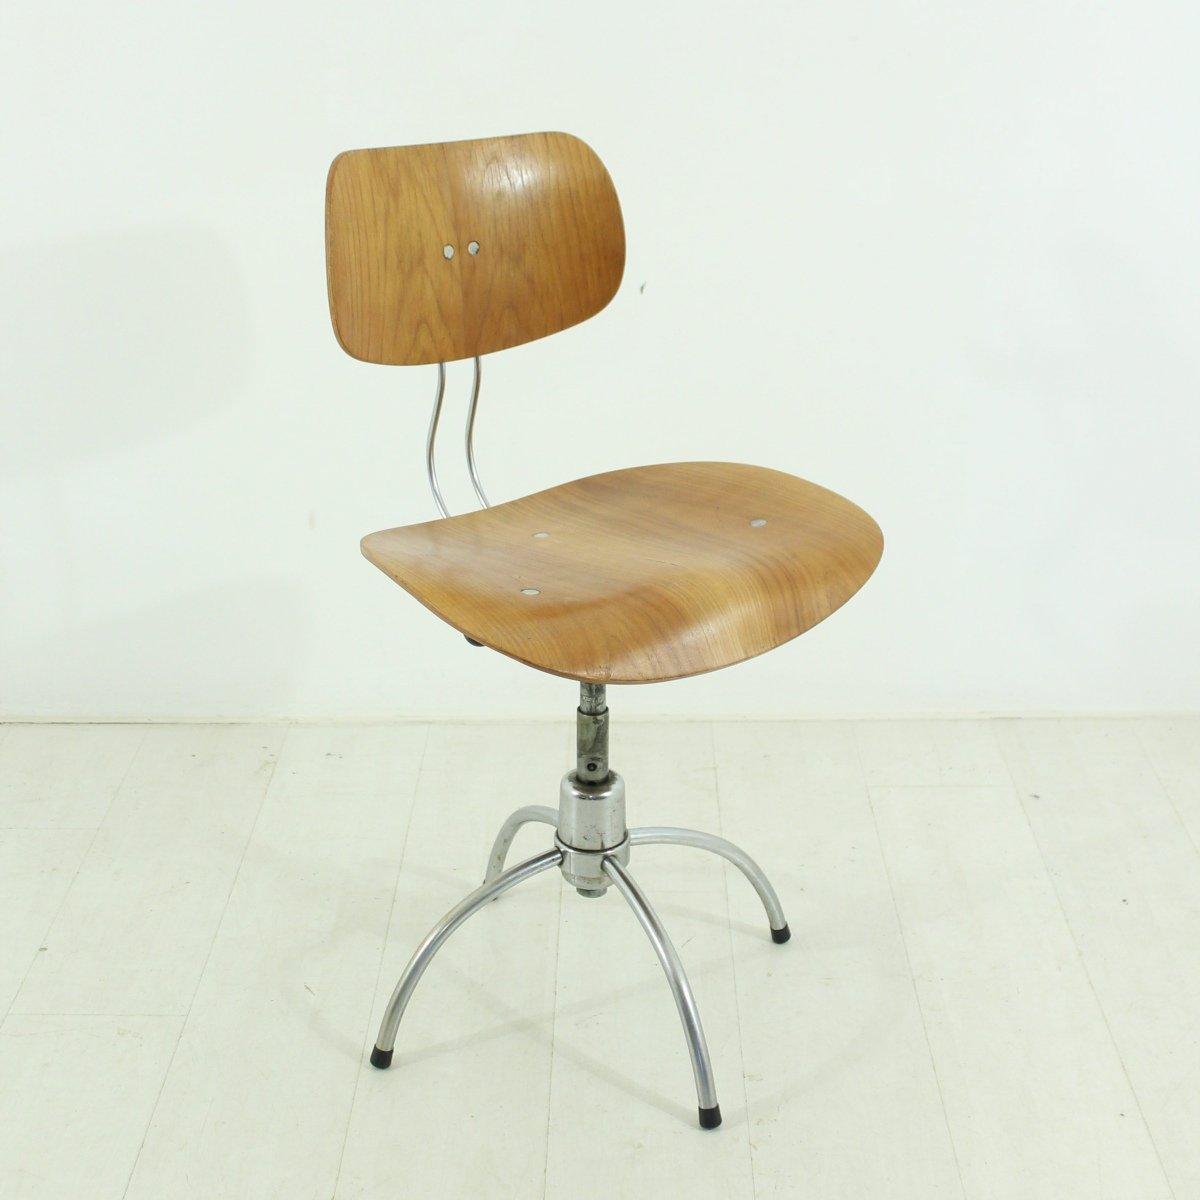 midcentury se  teak office chair by egon eiermann for sale at  - midcentury se  teak office chair by egon eiermann